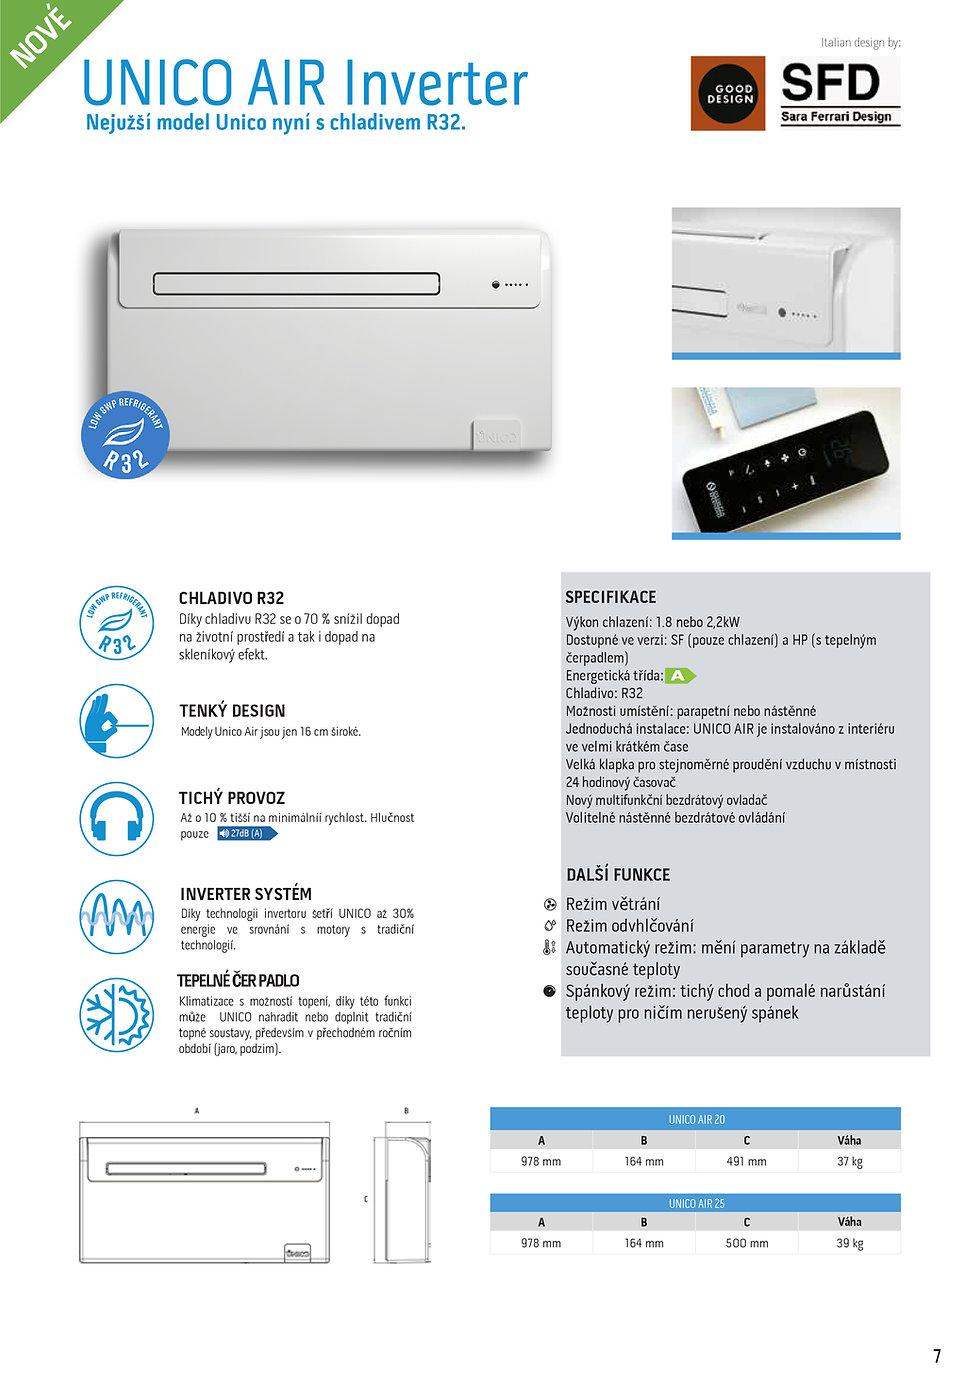 Katalog Unico 2021 Tradesam-09.jpg